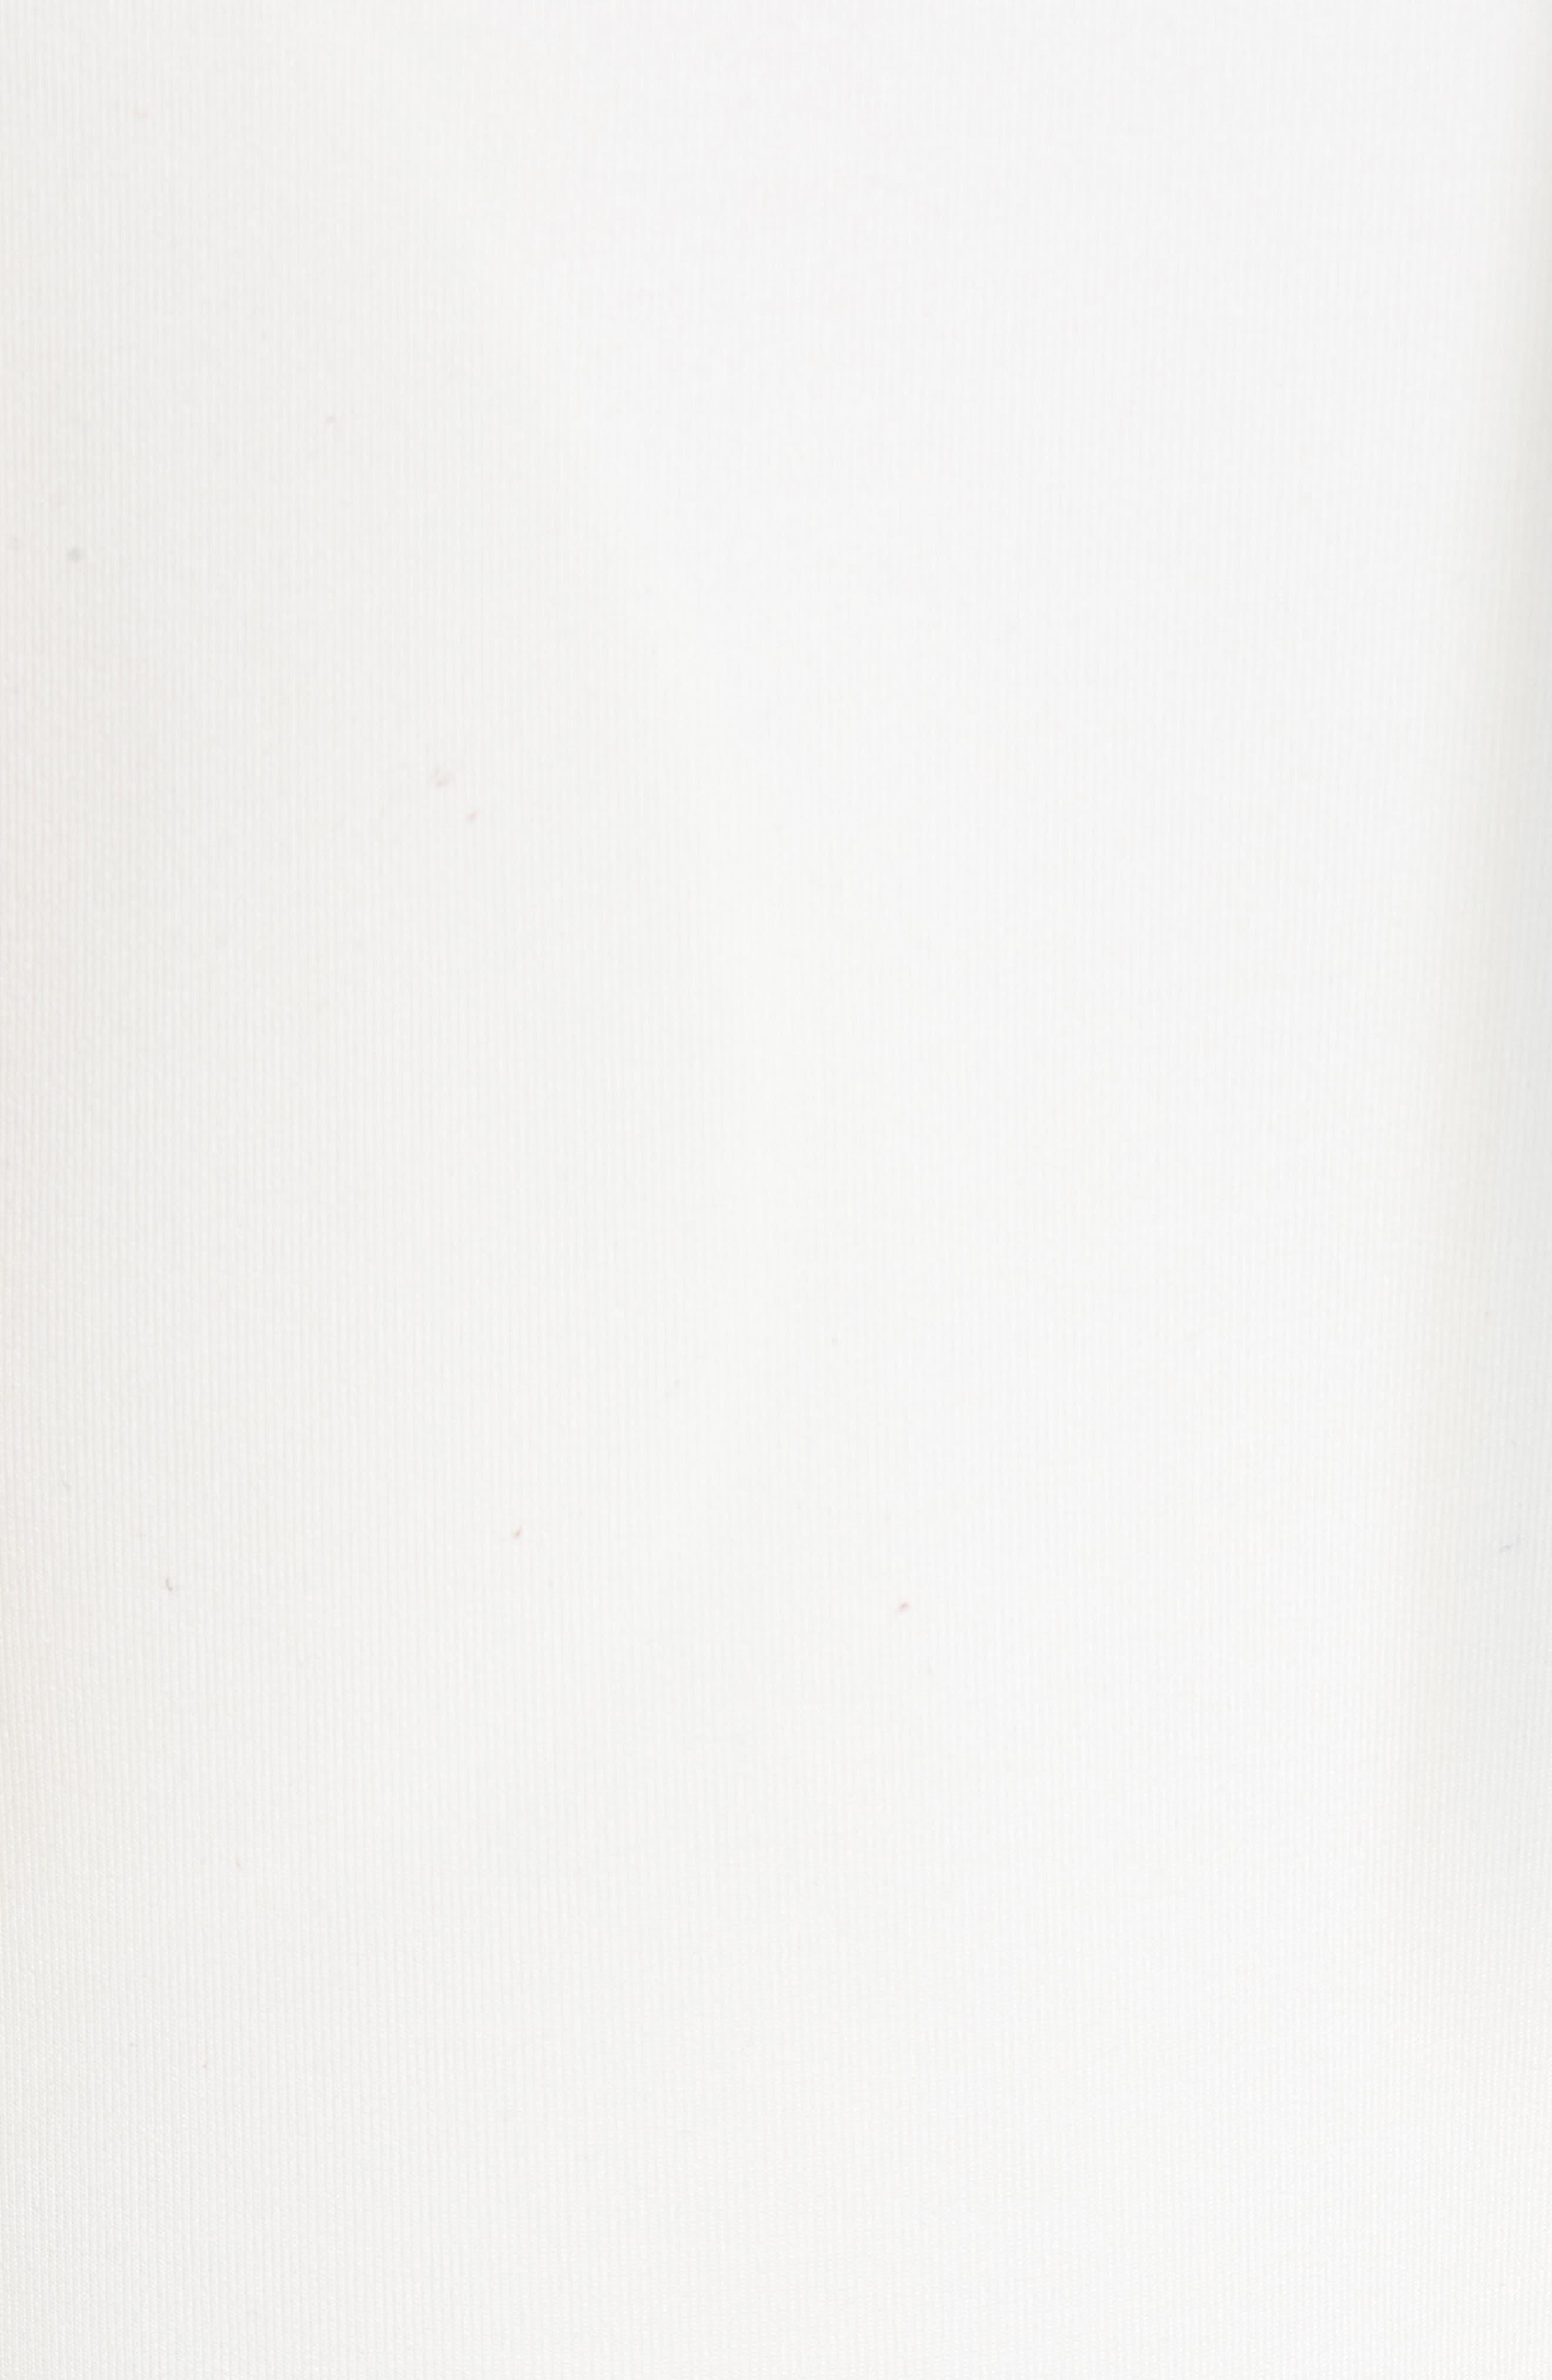 Sportswear Flight Tech Pants,                             Alternate thumbnail 5, color,                             Summit White/ Black